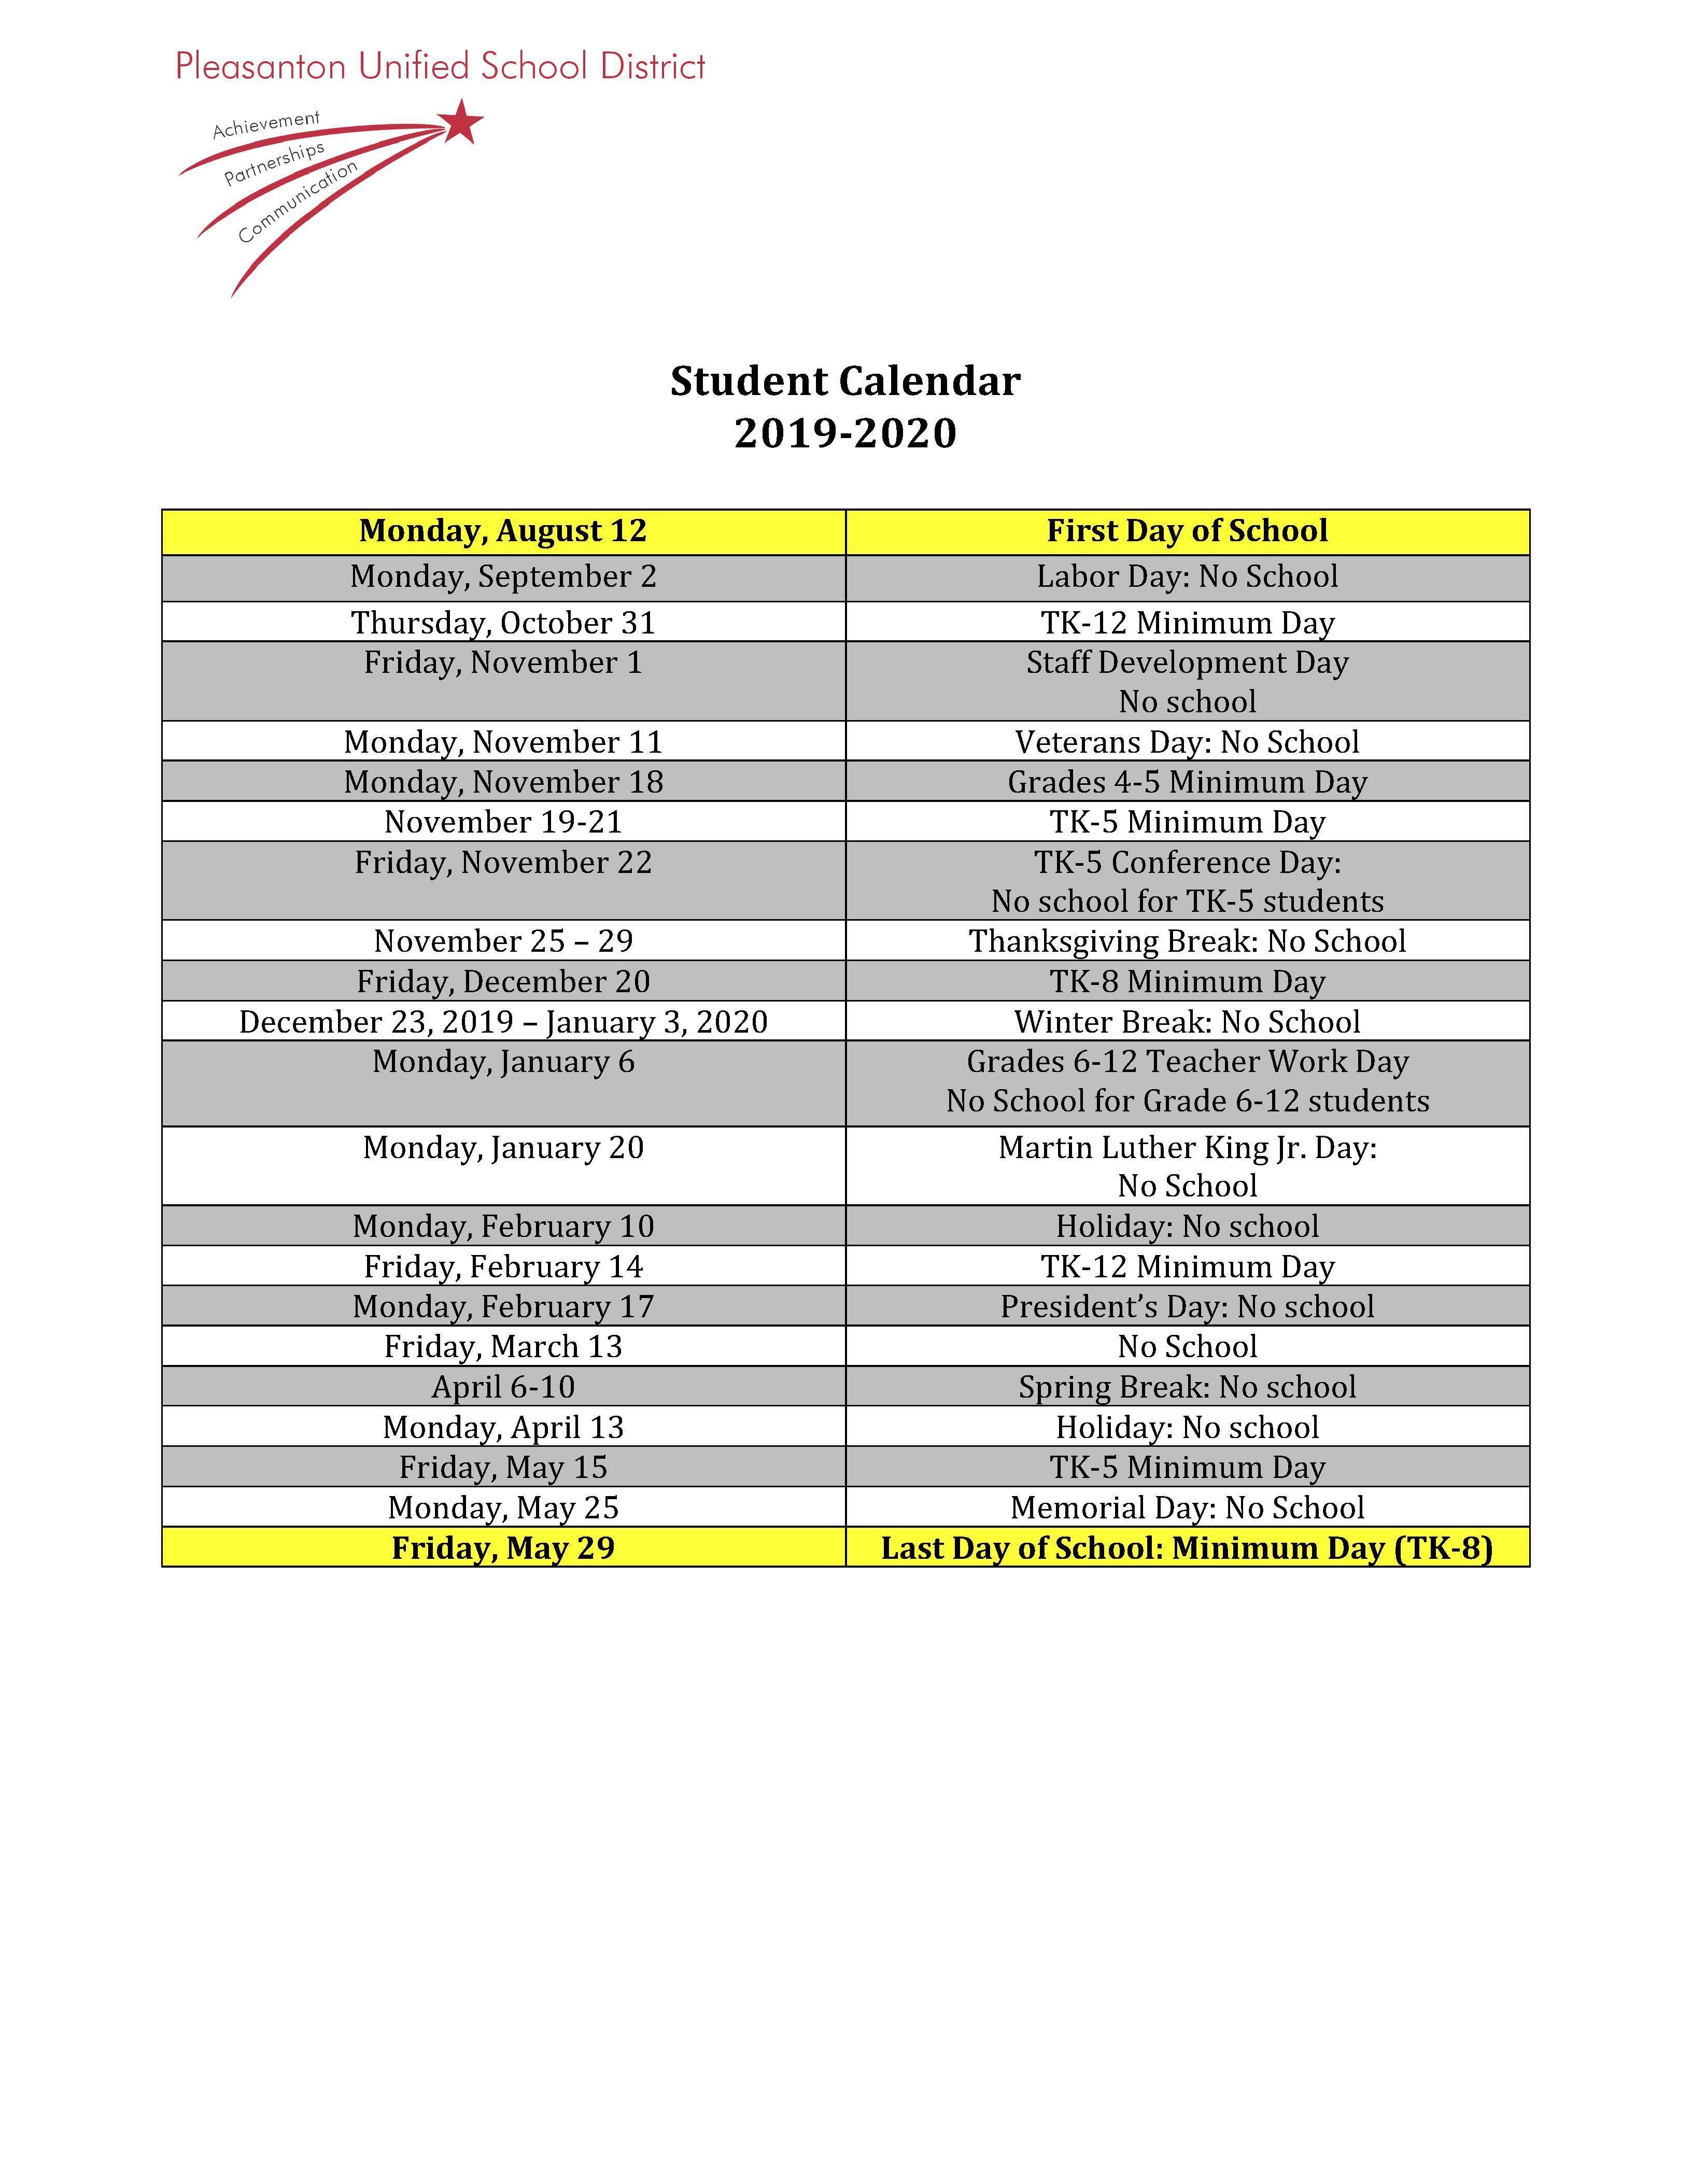 Calendars - Miscellaneous - Pleasanton Unified School District intended for 2021-2021 Kansas City School District Calendar